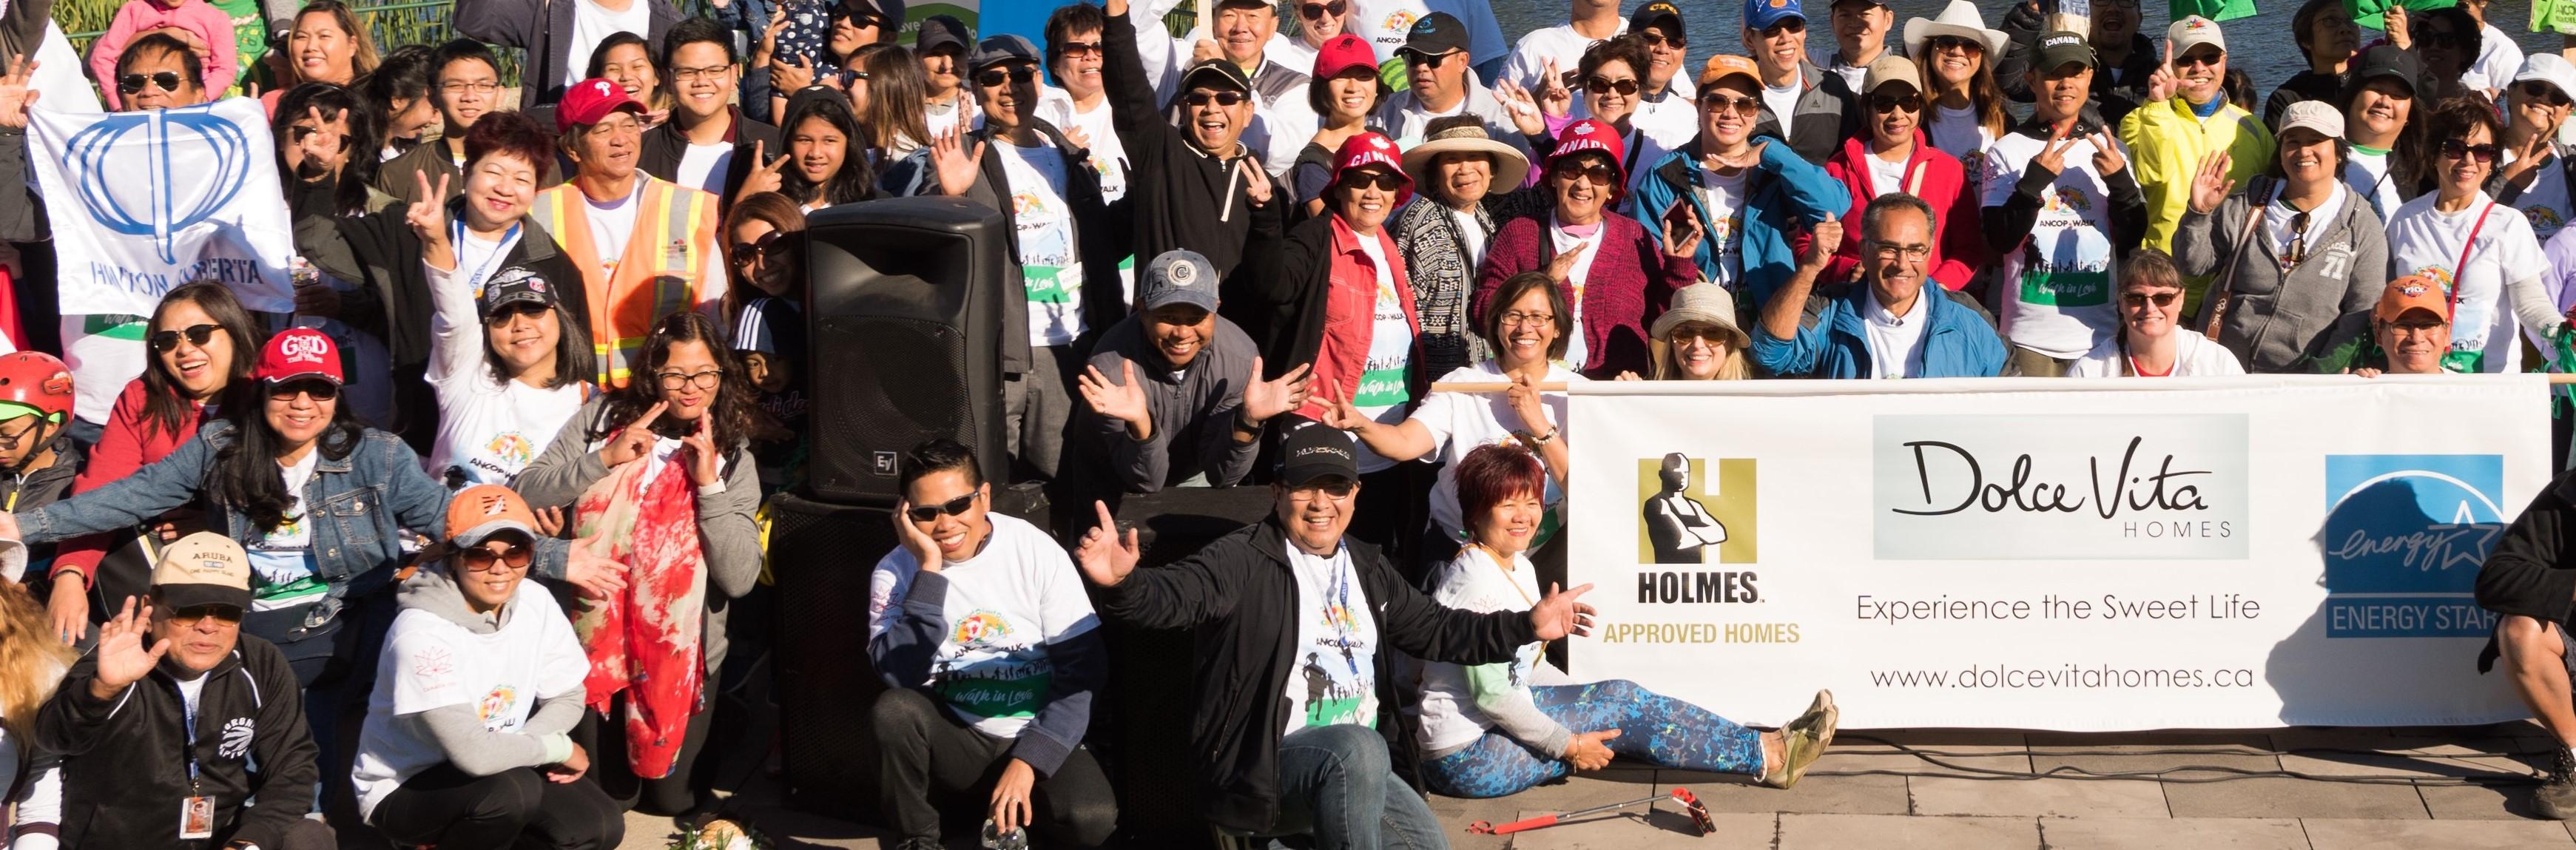 Edmontonians Walk for a Noble Cause